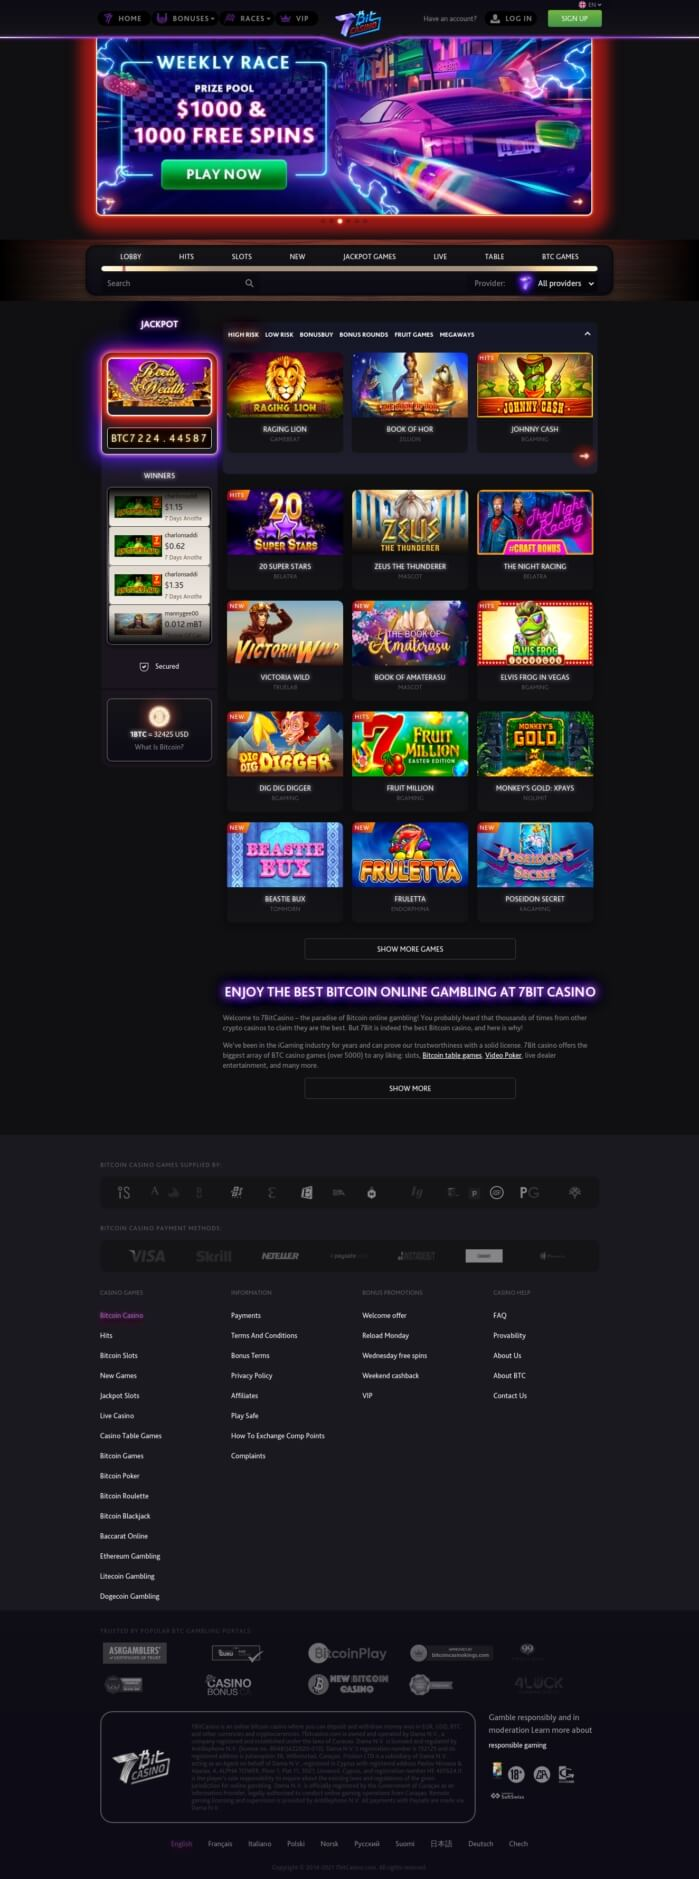 7Bit Bitcoin Casino Review